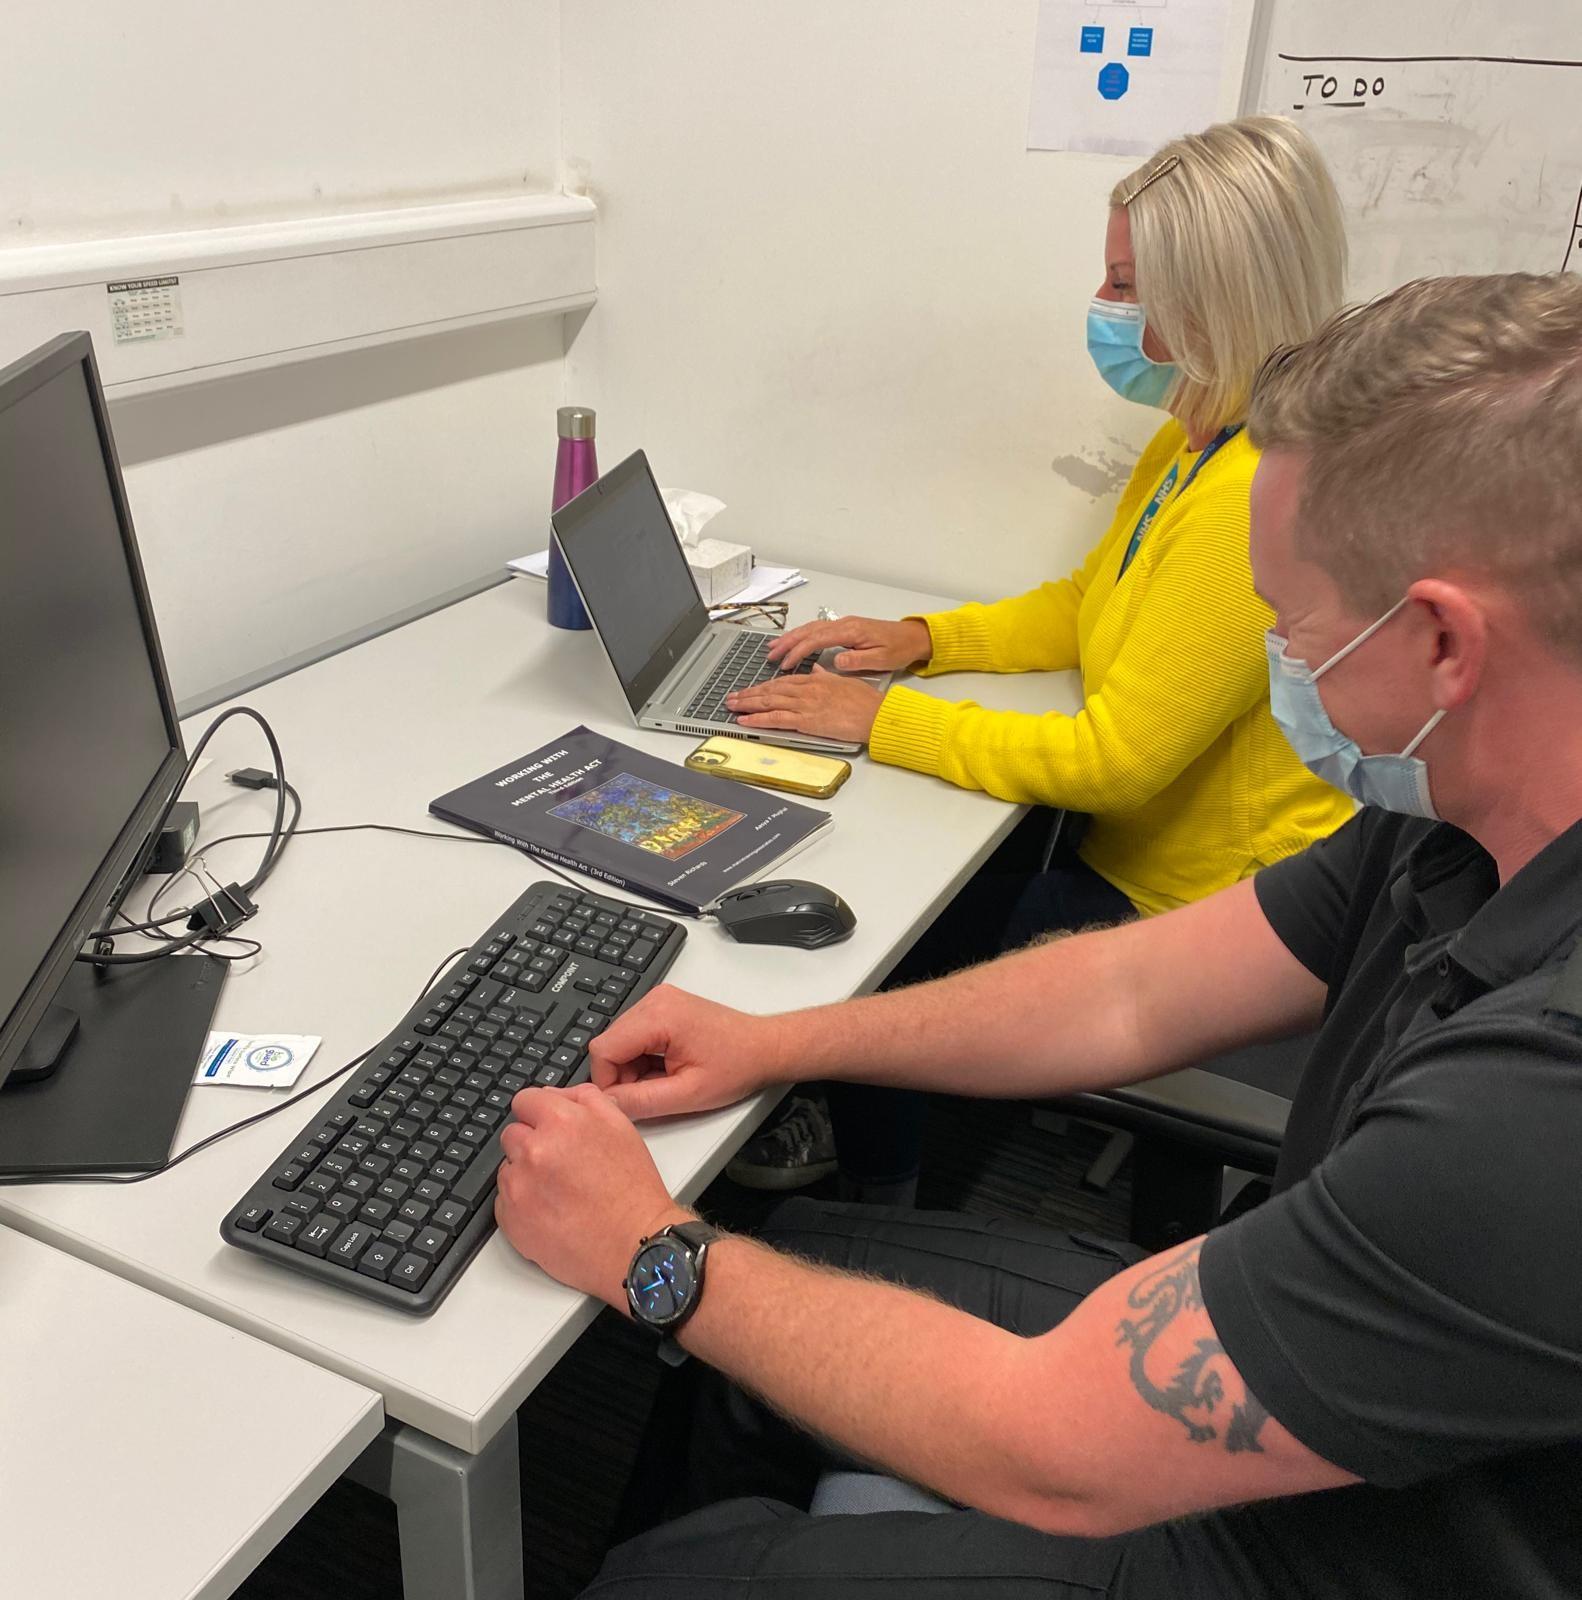 PC Chris Rudd and Registered Mental Health Nurse Deborah Mawson at a desk at the Street Triage Team's base.